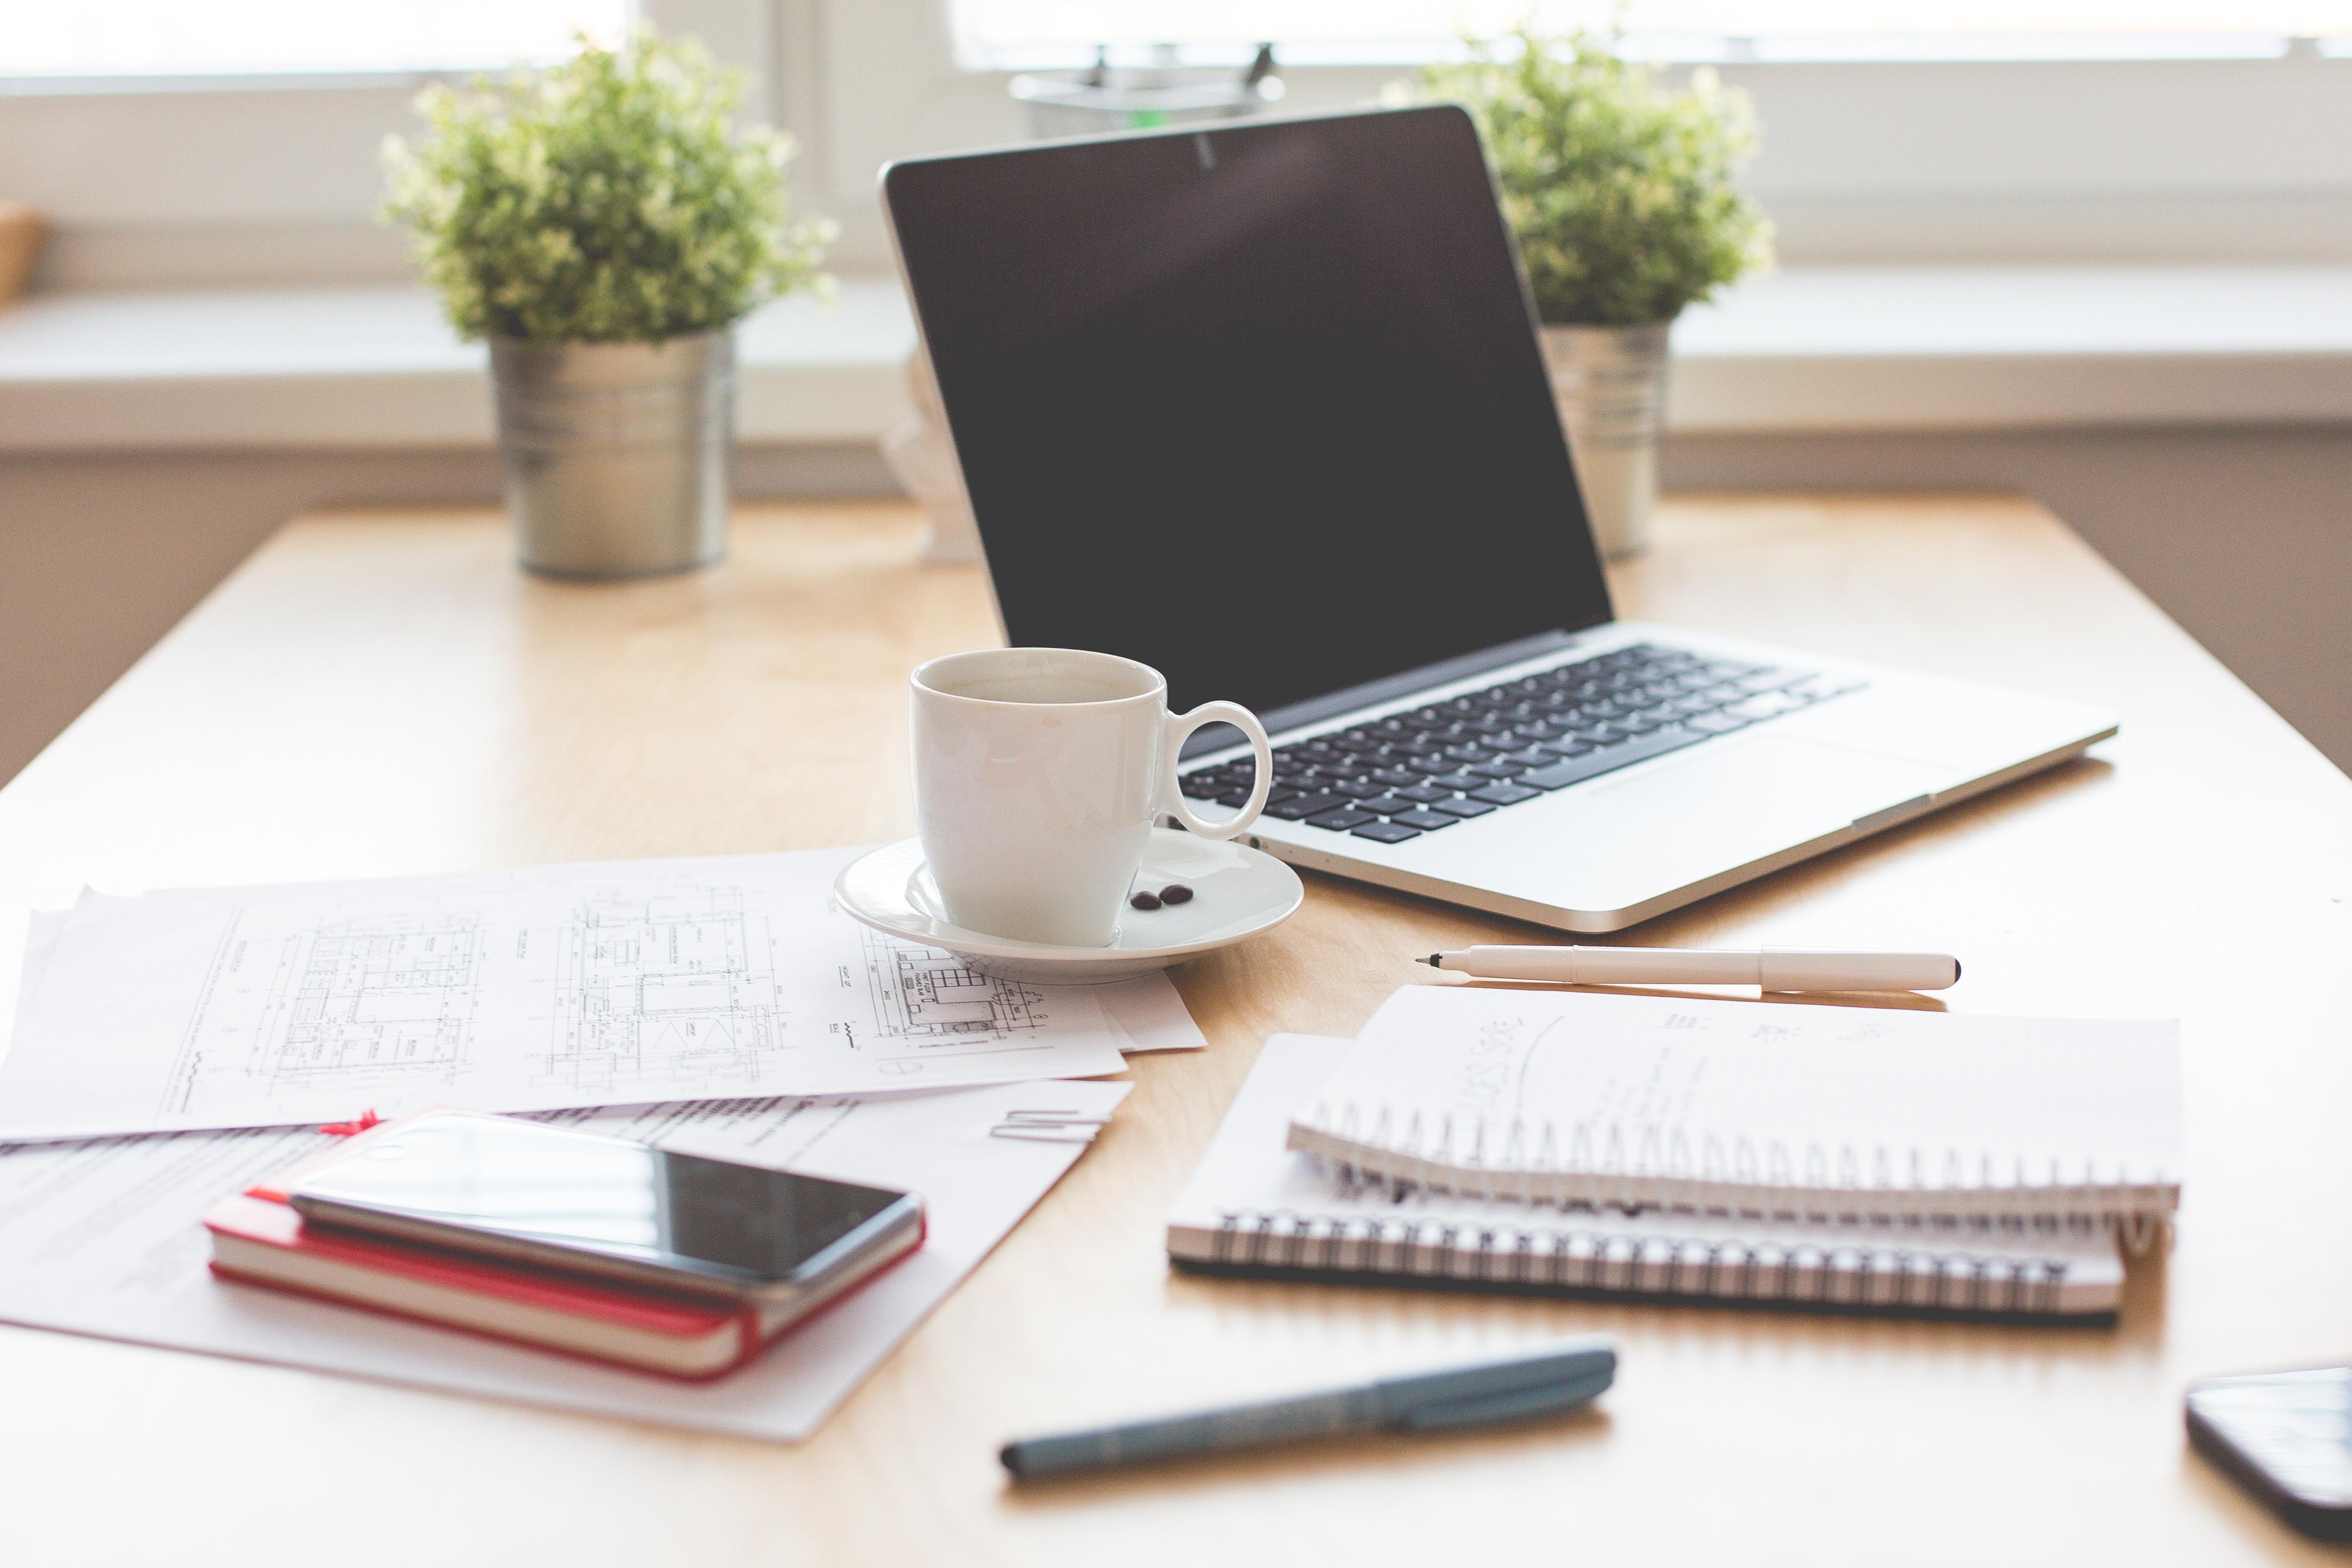 officeconference-room-workspace.jpg